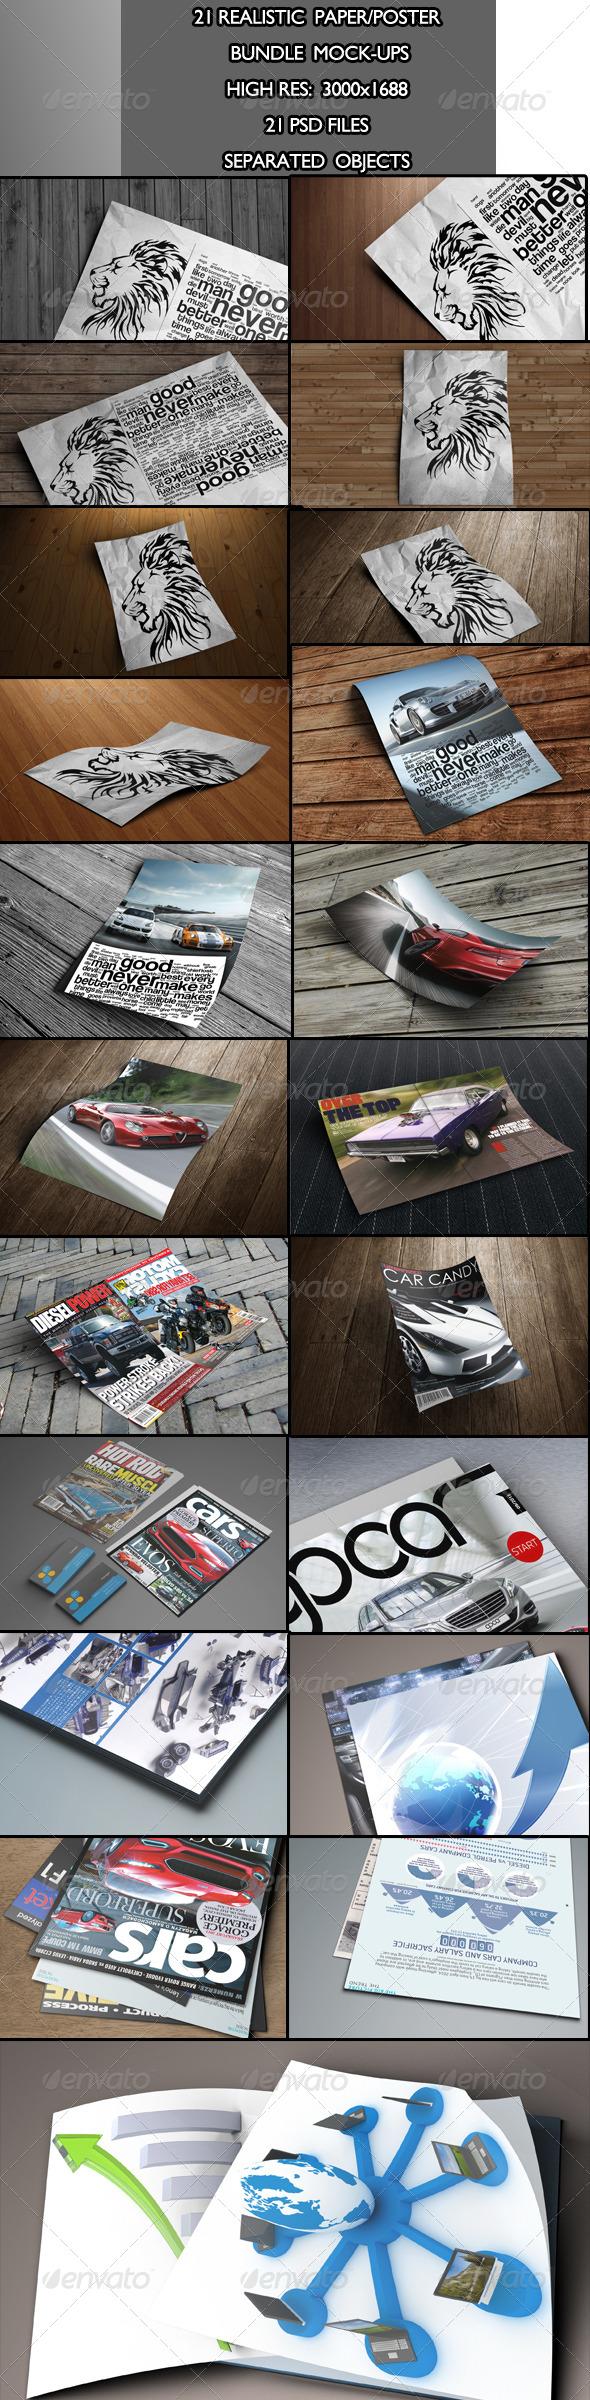 Realistic Paper Poster Bundle Mock-Ups